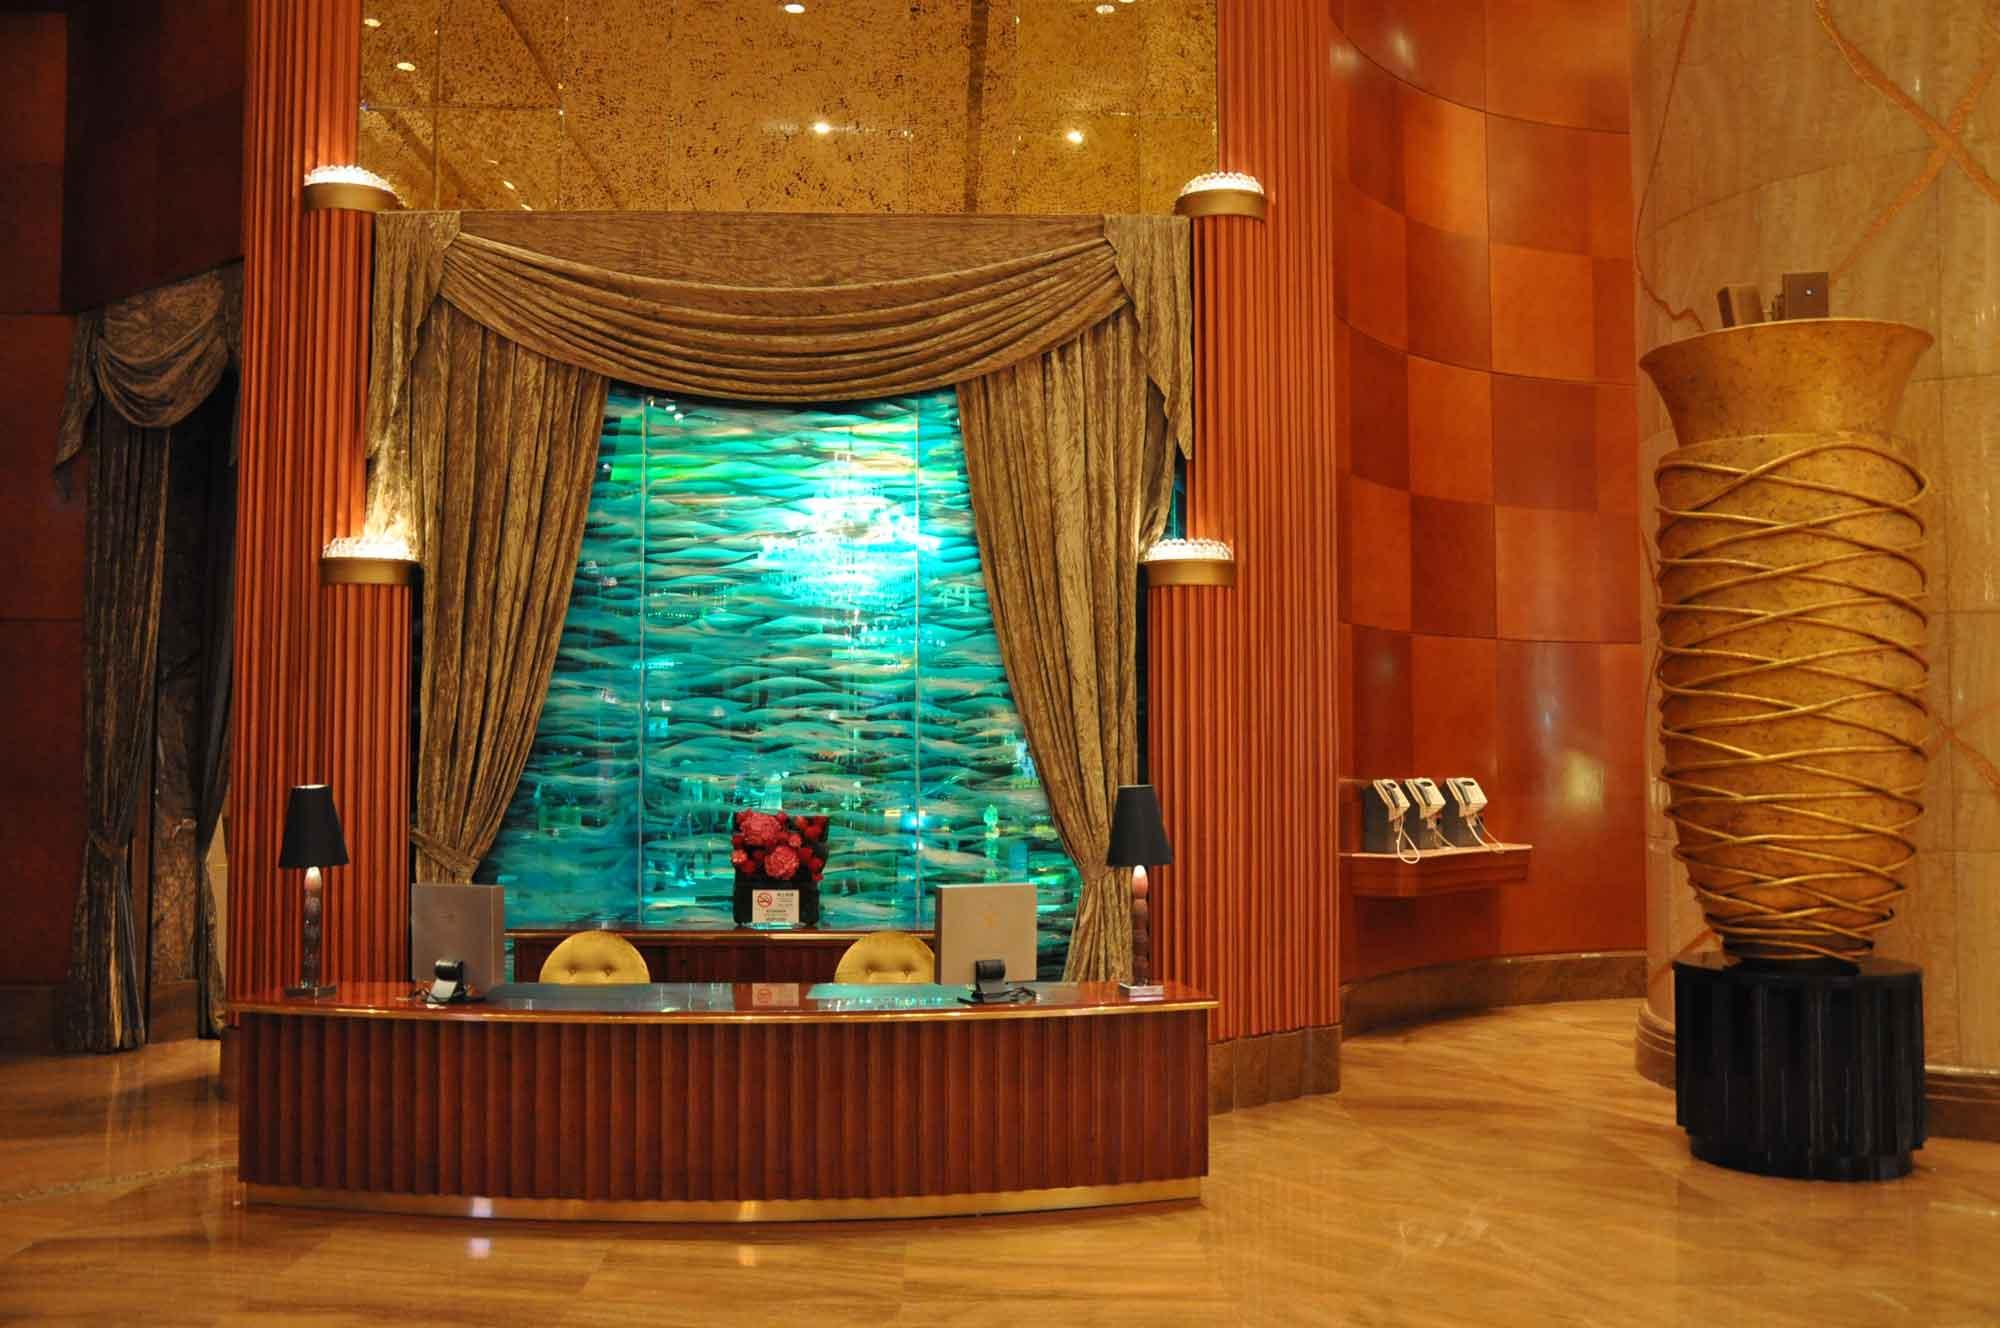 Starworld Macau concierge